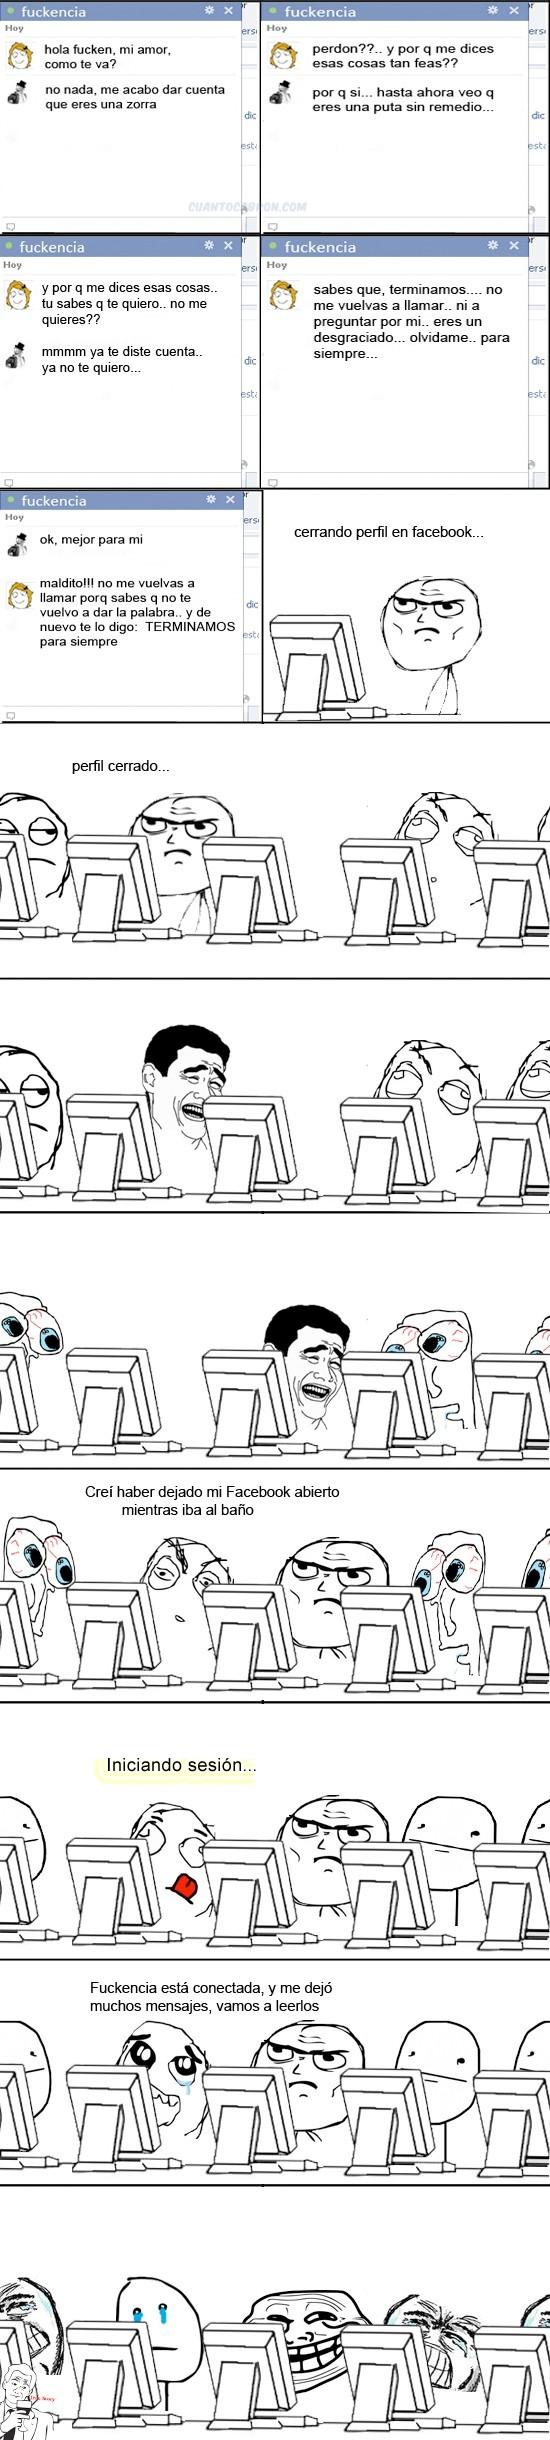 Trollface - Trolleo épico en facebook